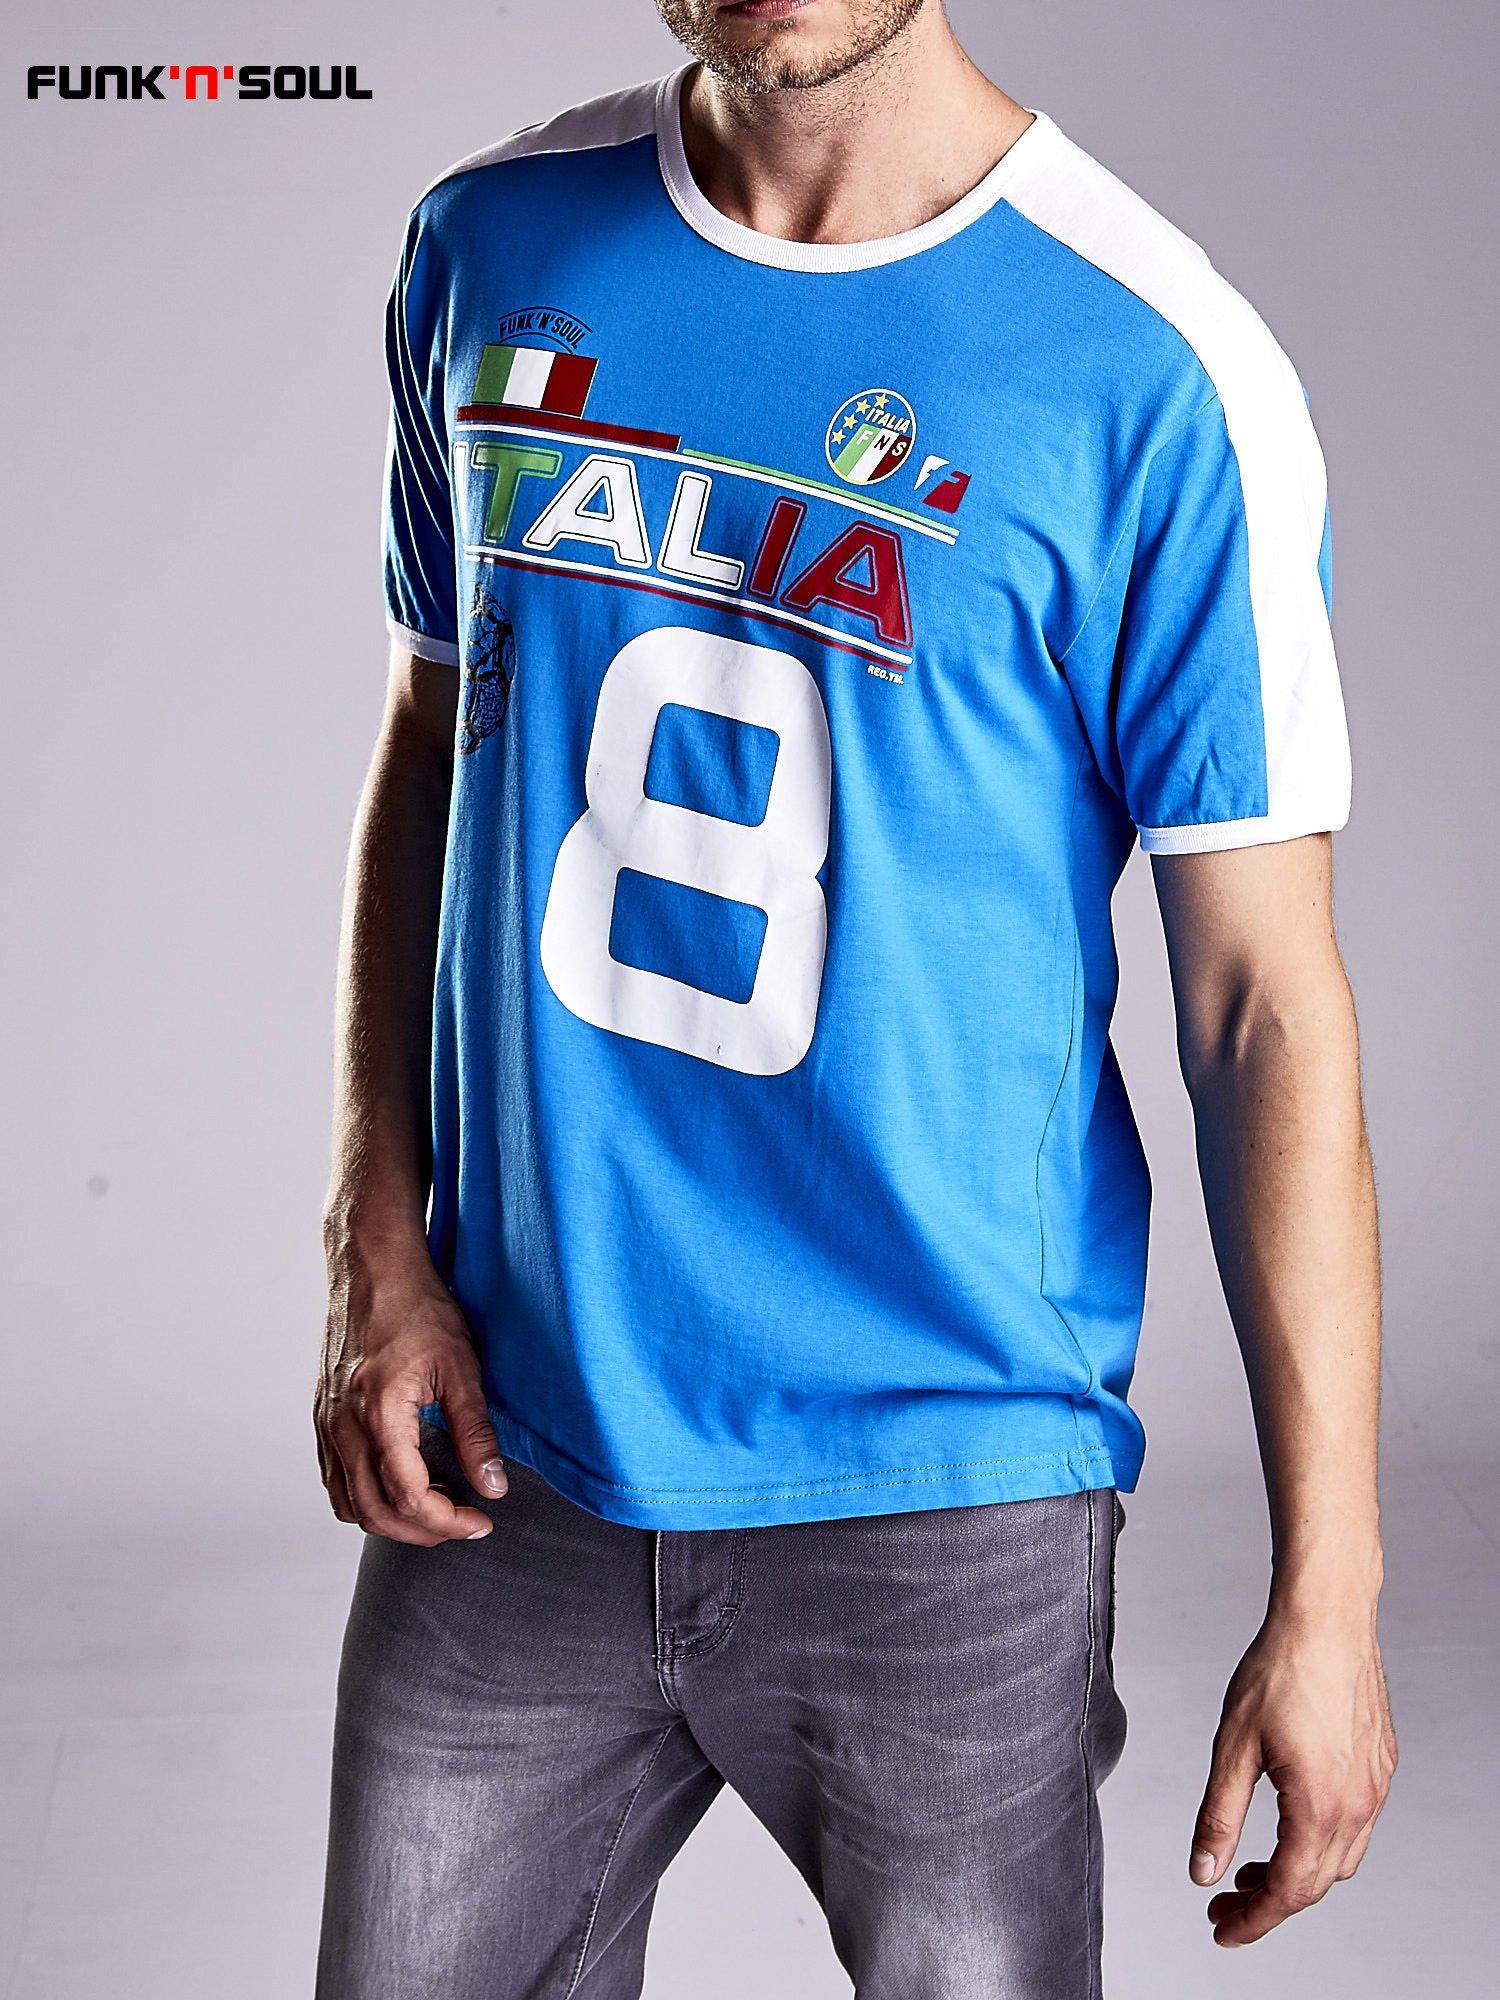 Niebieski t-shirt męski z napisem ITALIA Funk n Soul                                  zdj.                                  5